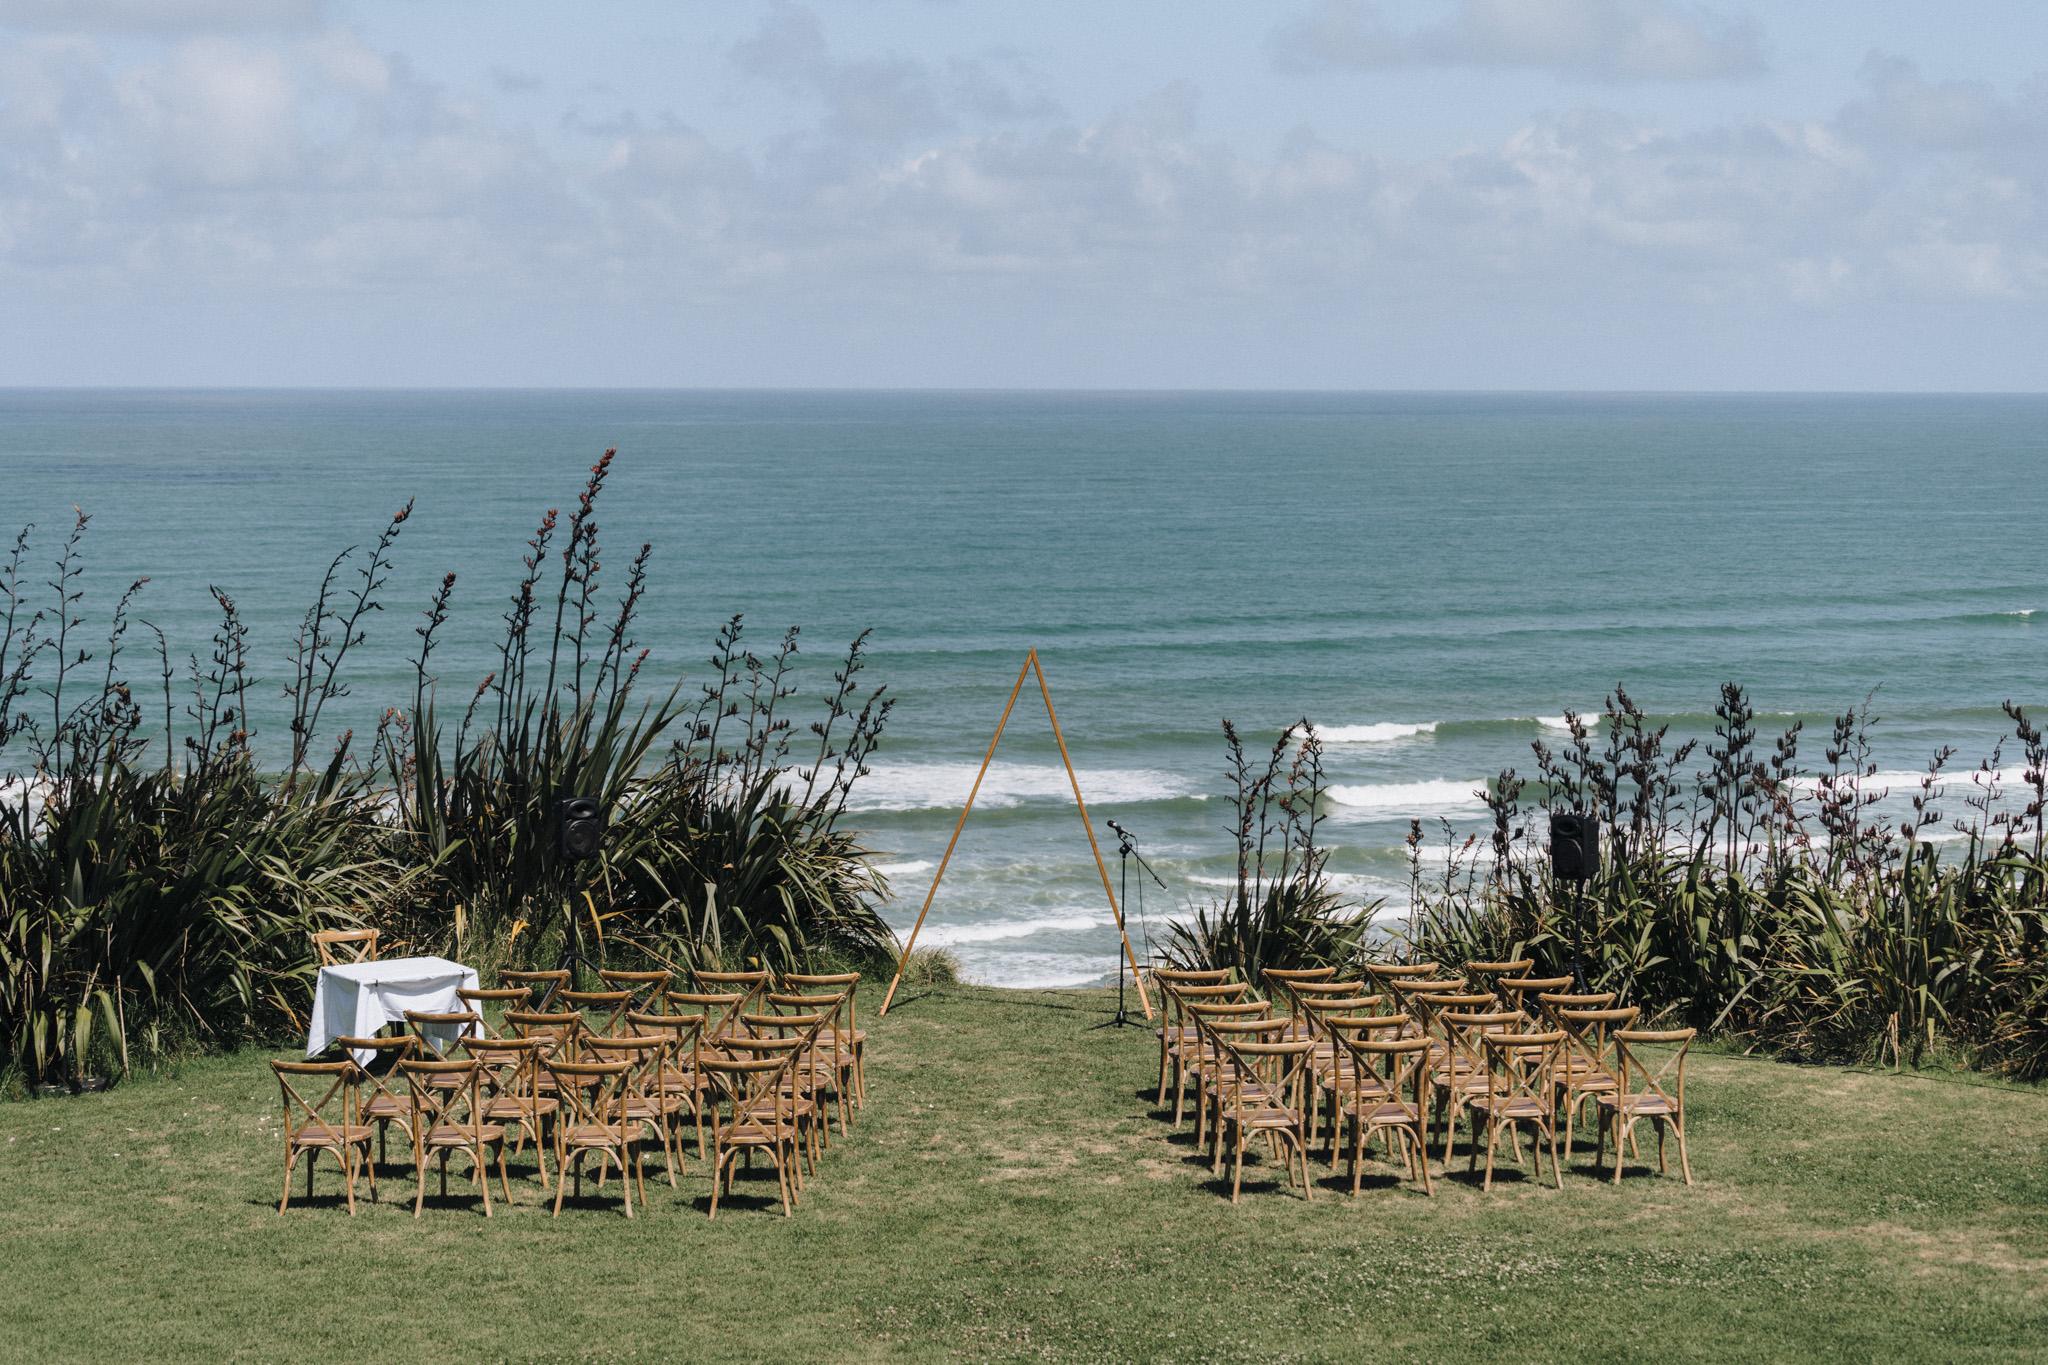 newfound-h-m-castaways-waiuku-auckland-wedding-photographer-105